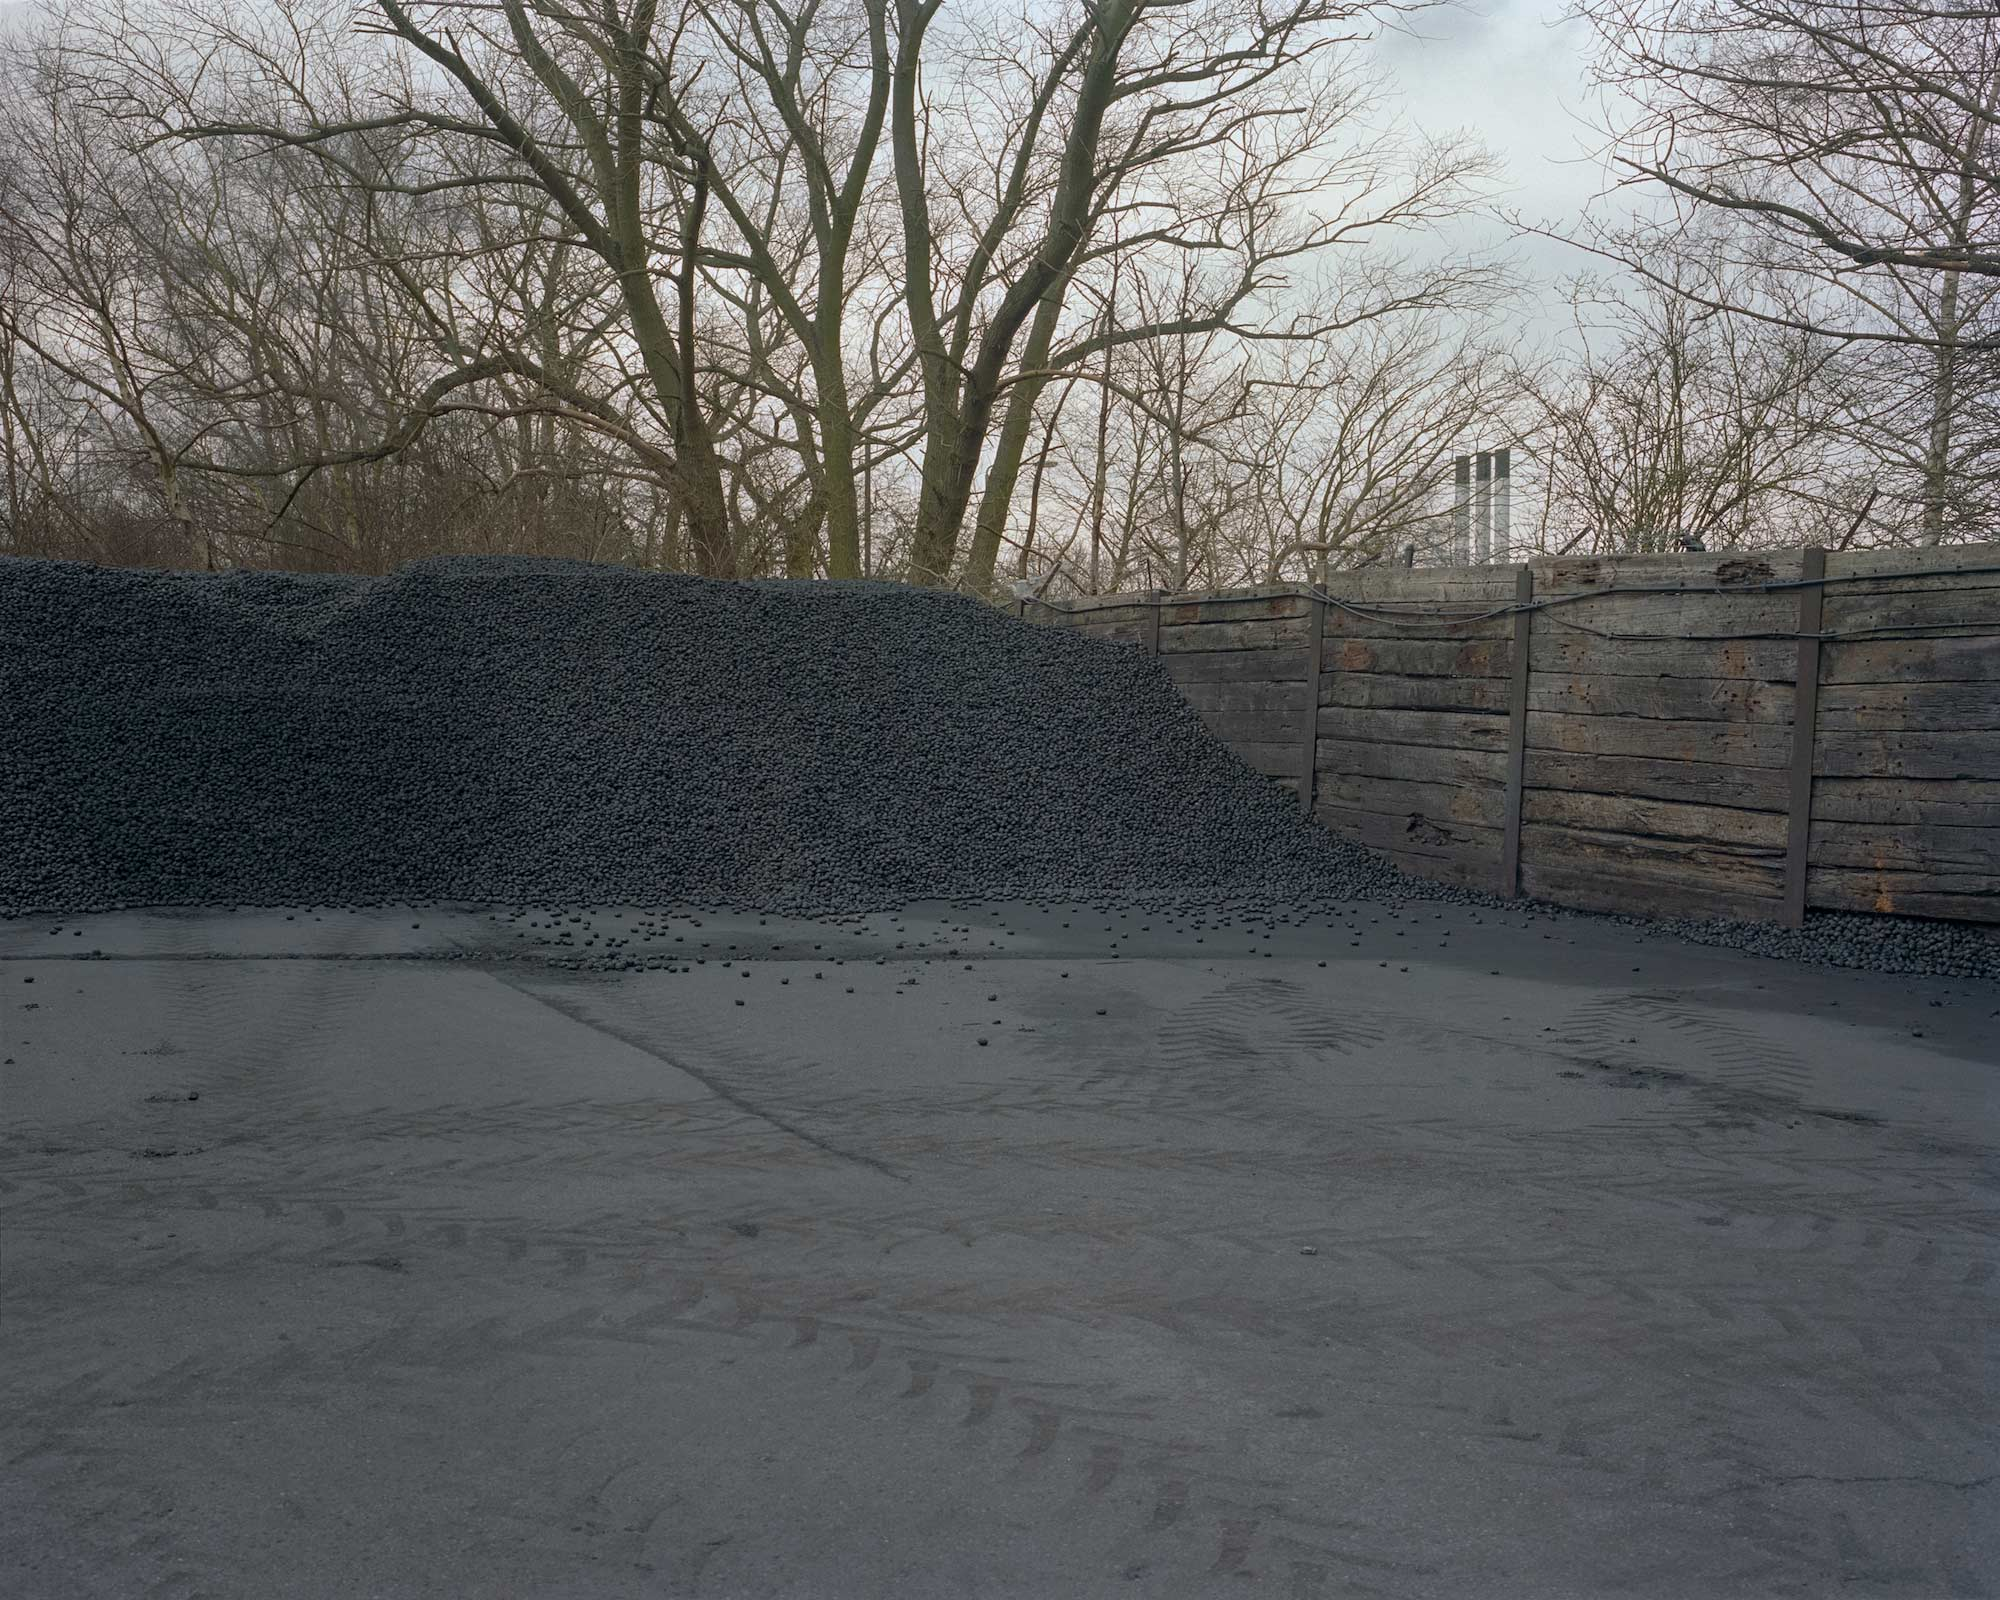 Coal depot, Mansfield, Nottinghamshire.